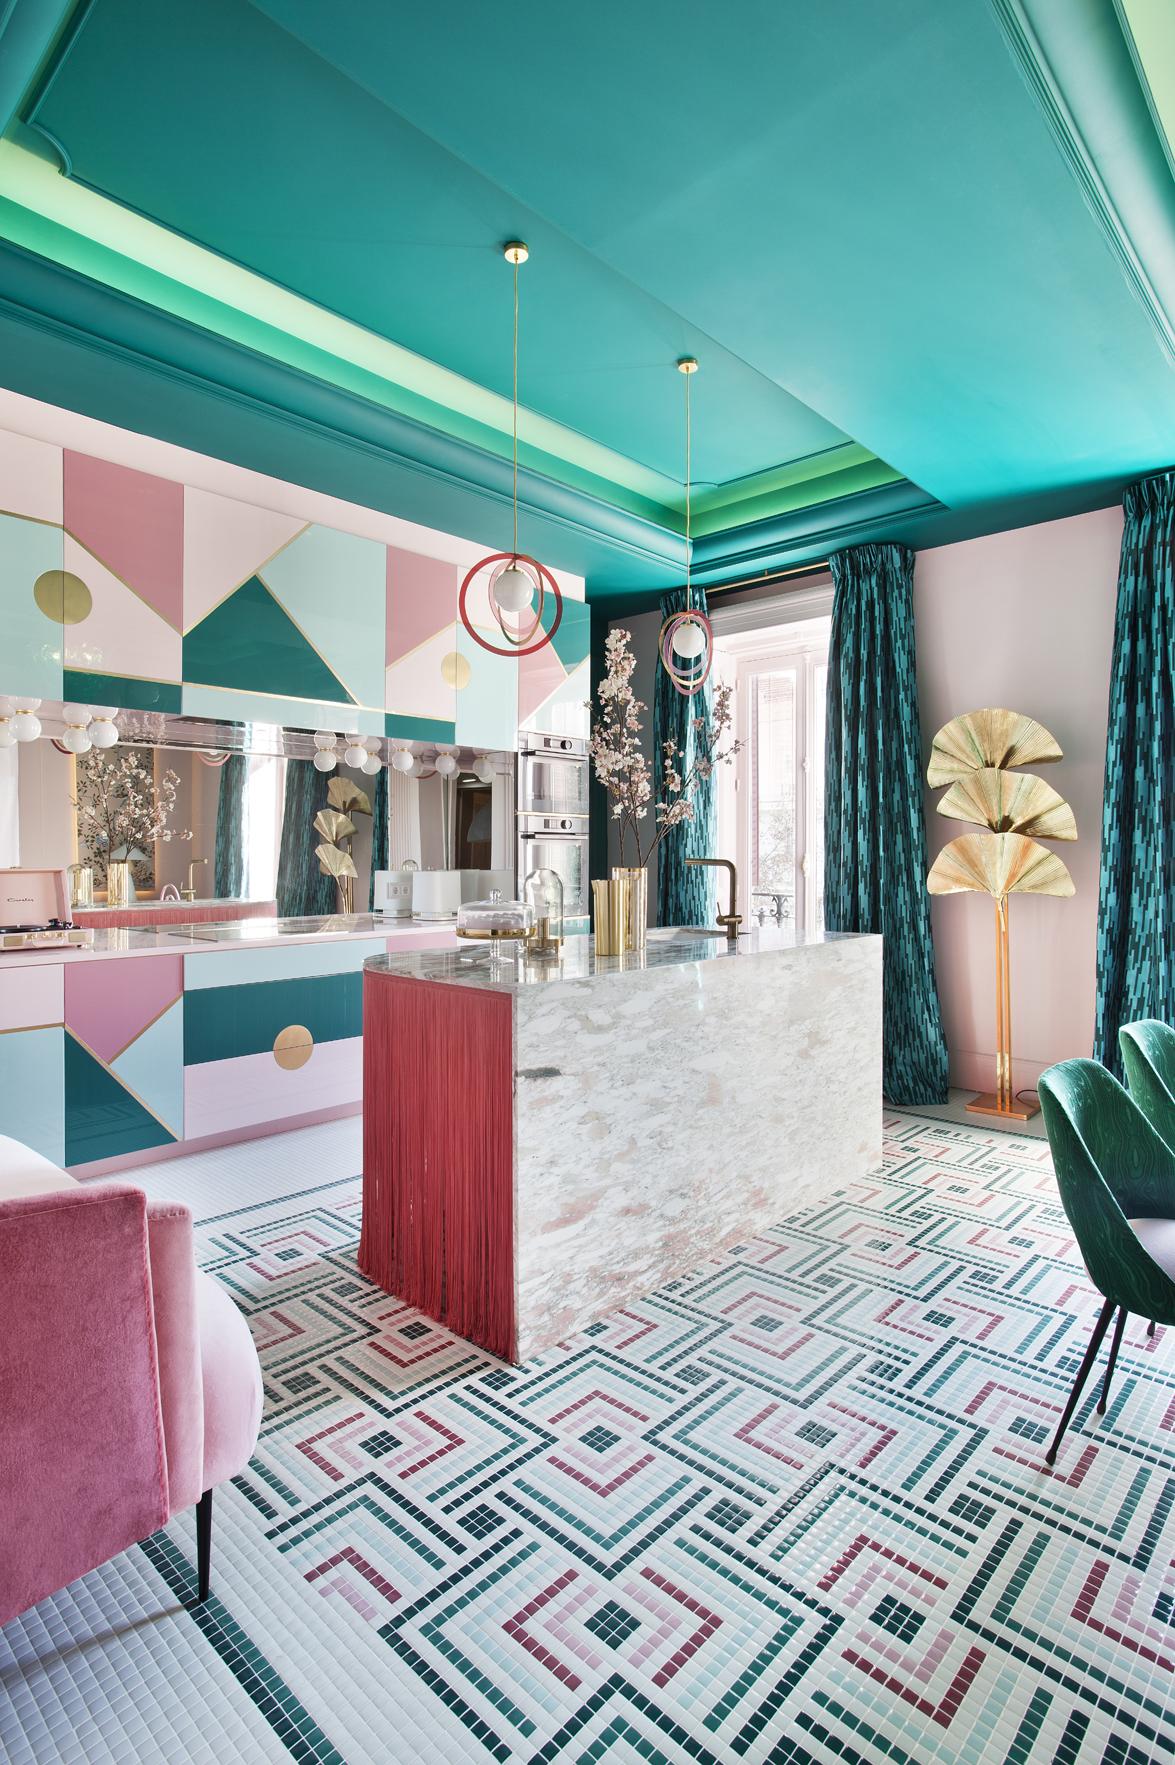 Casa decor madrid 2018 abre sus puertas la pasarela de la - Casa decor 2017 madrid ...